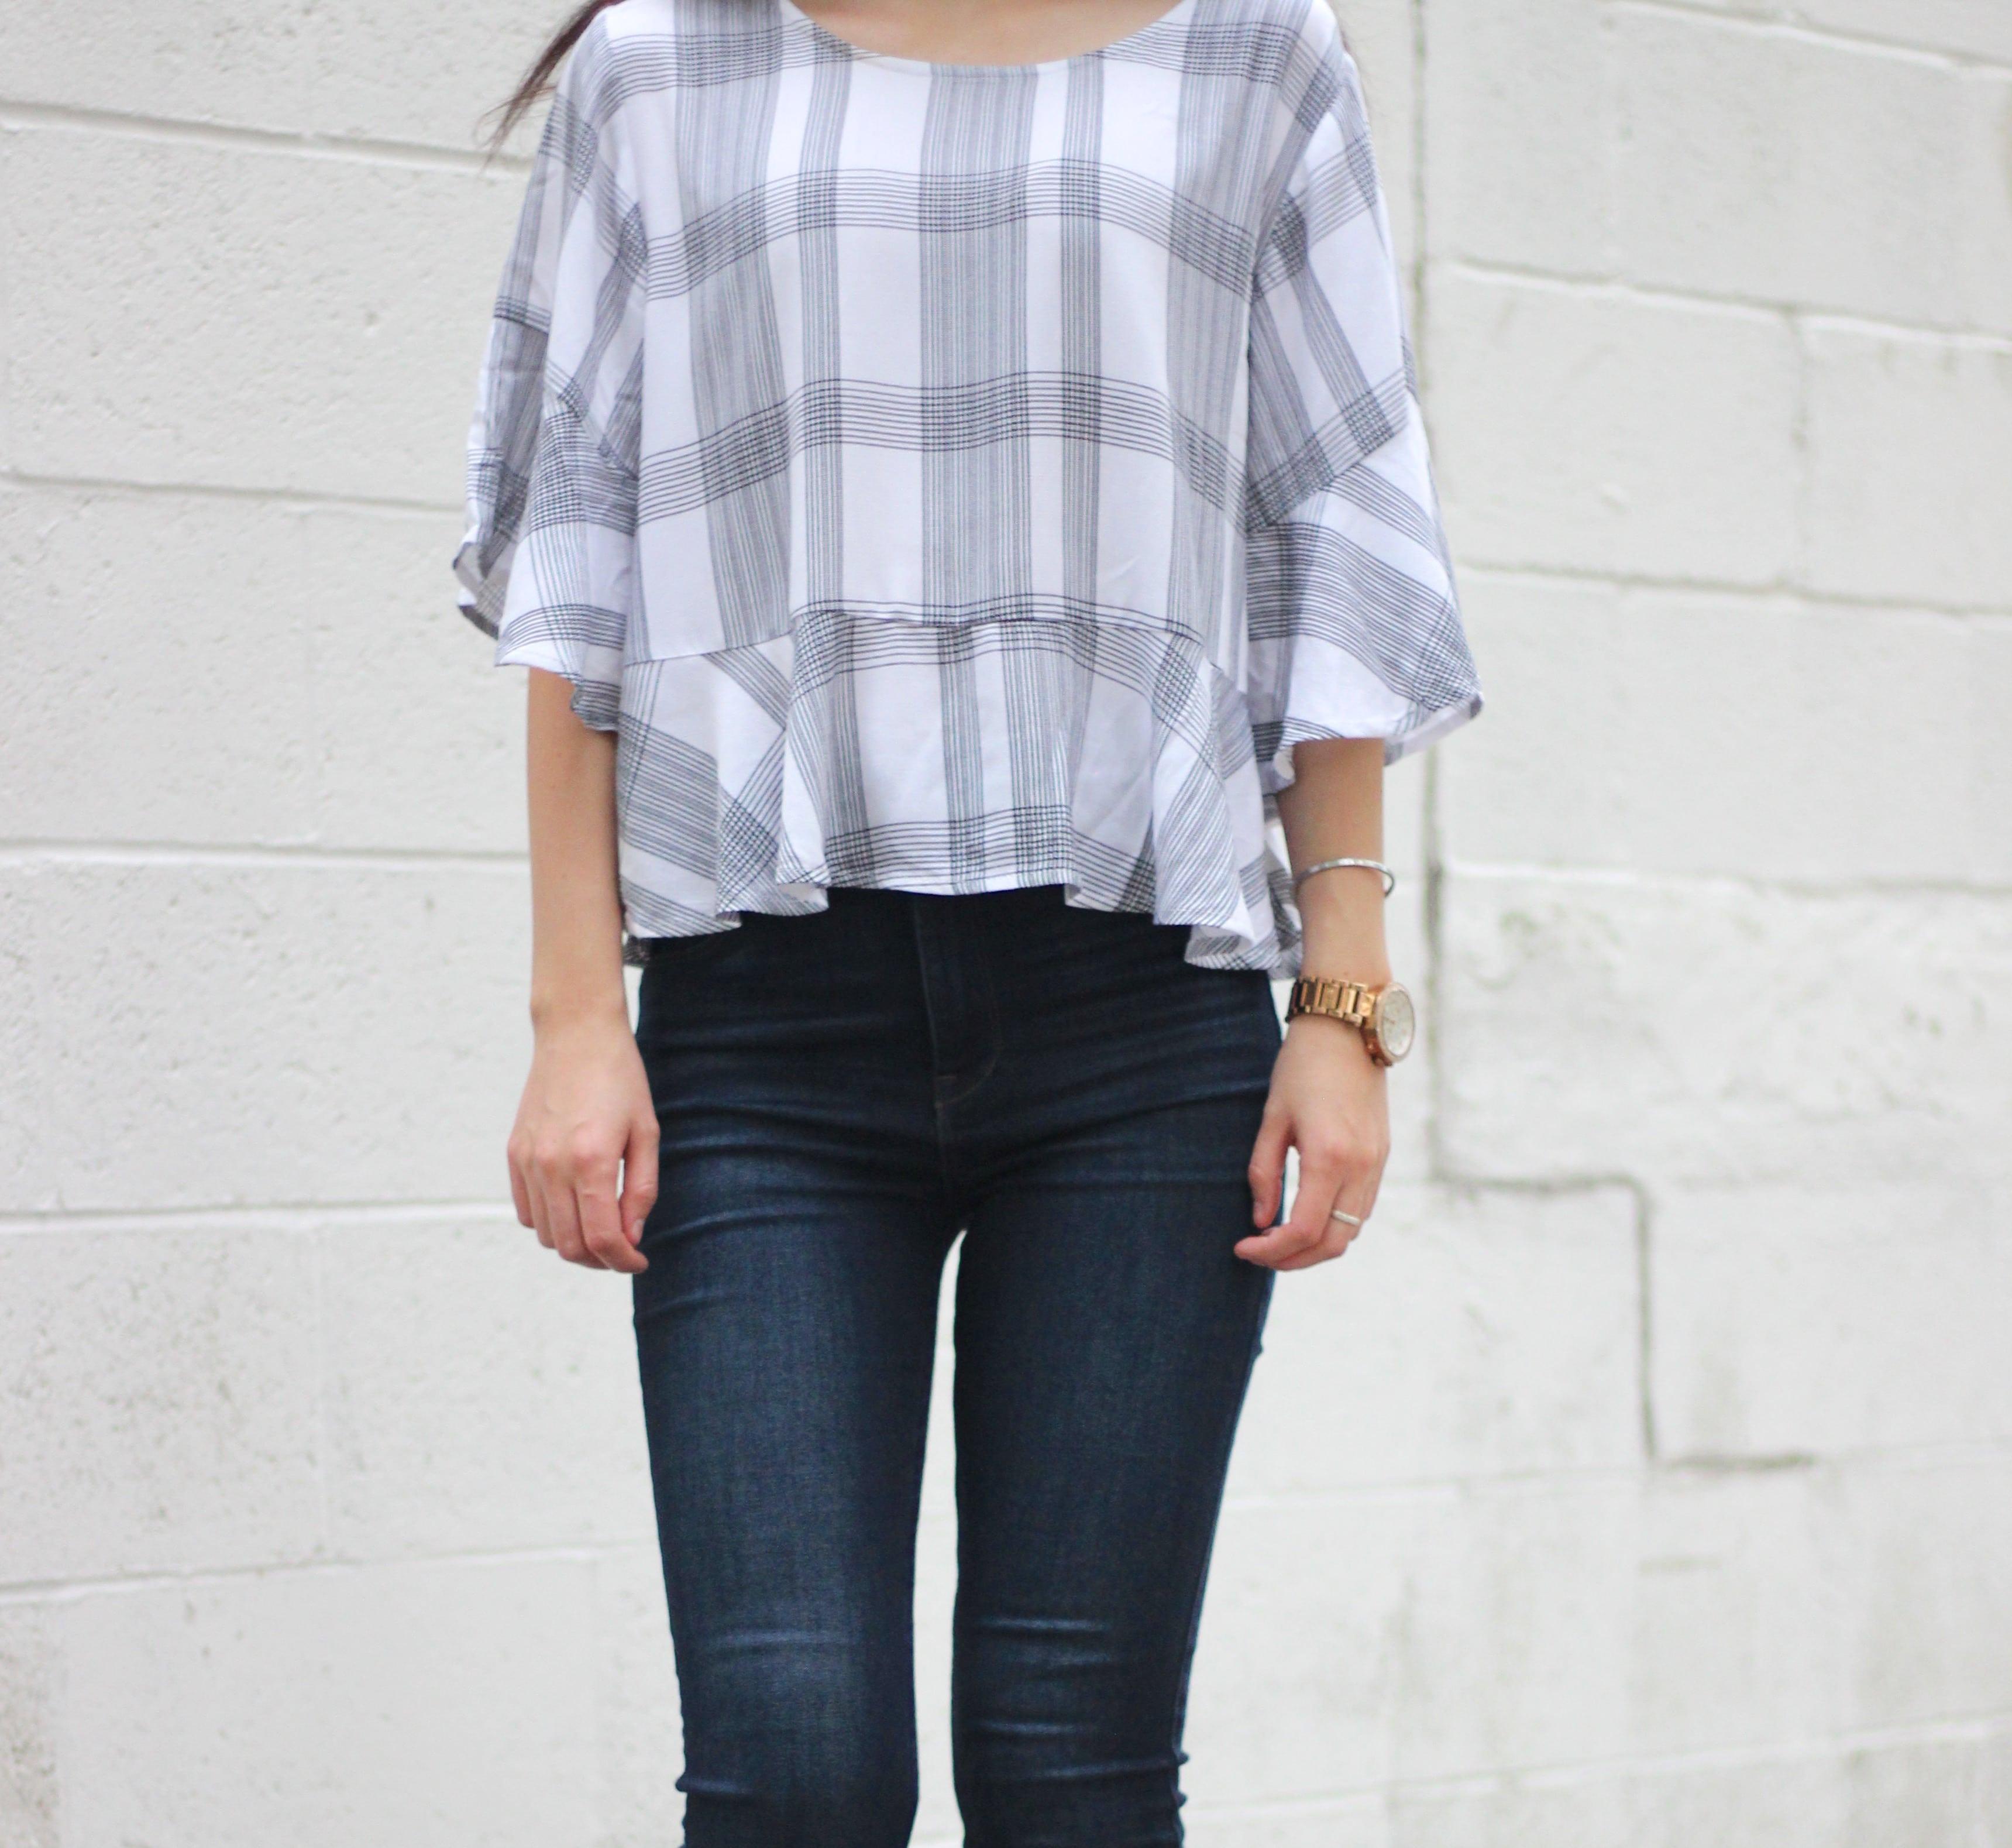 Plaid Top + Jeans : OOTD